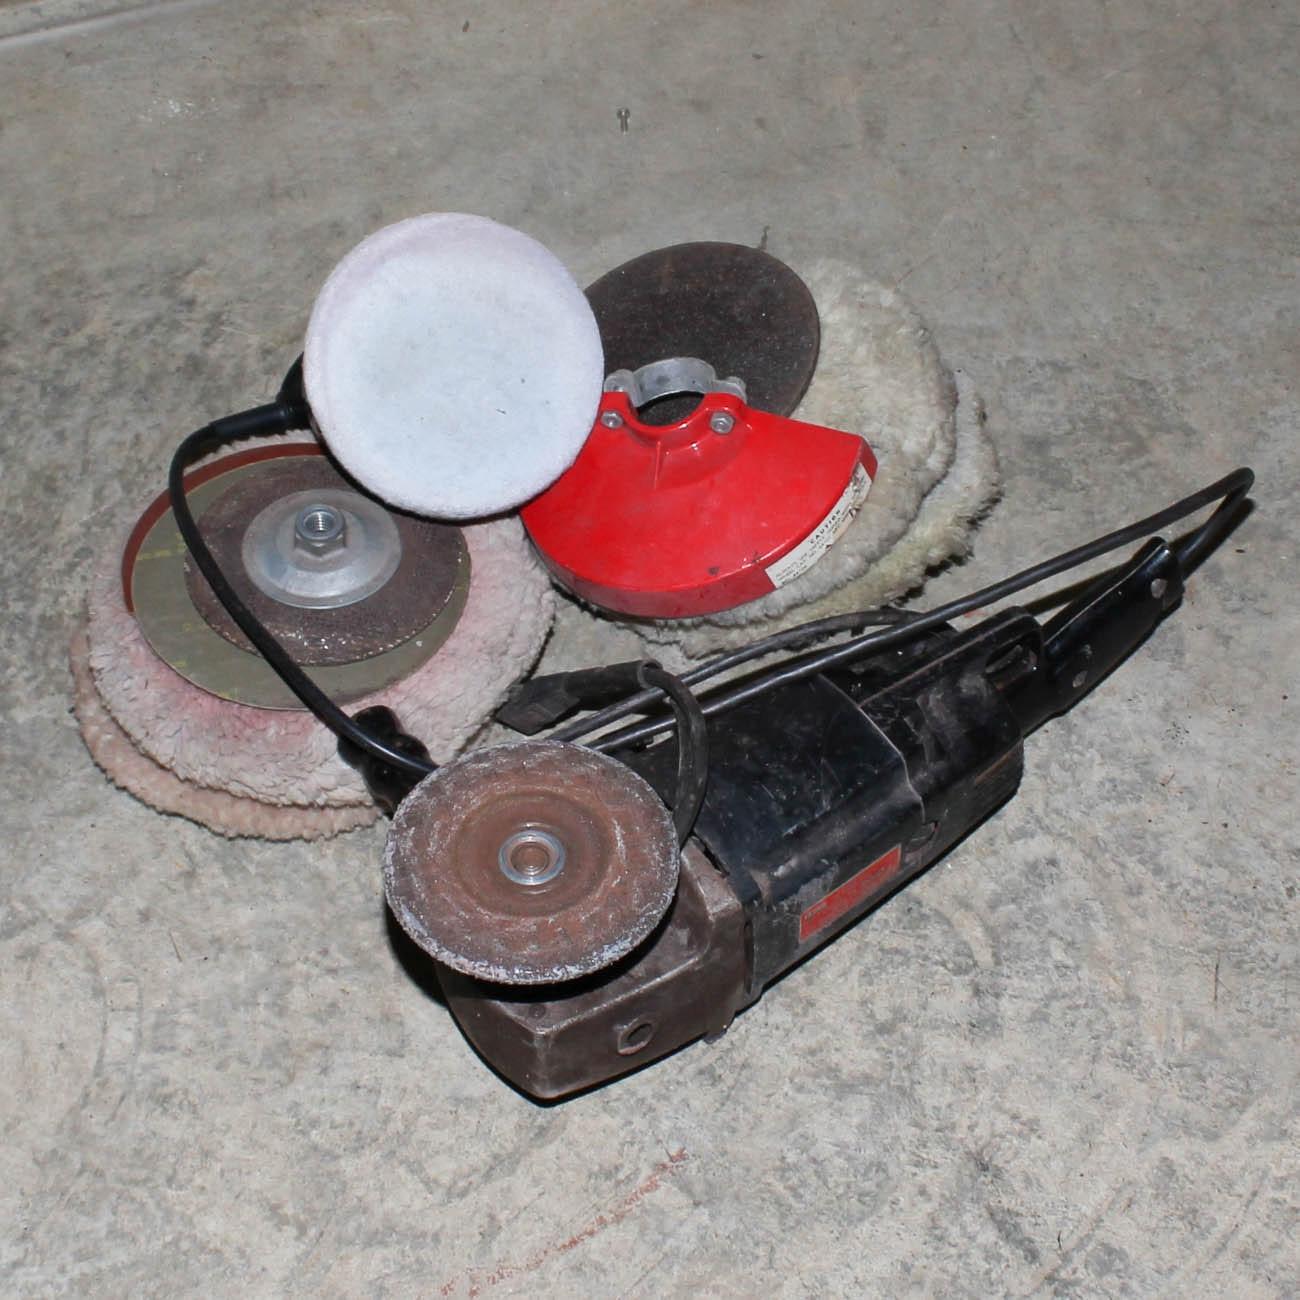 Craftsman Sander and Accessories